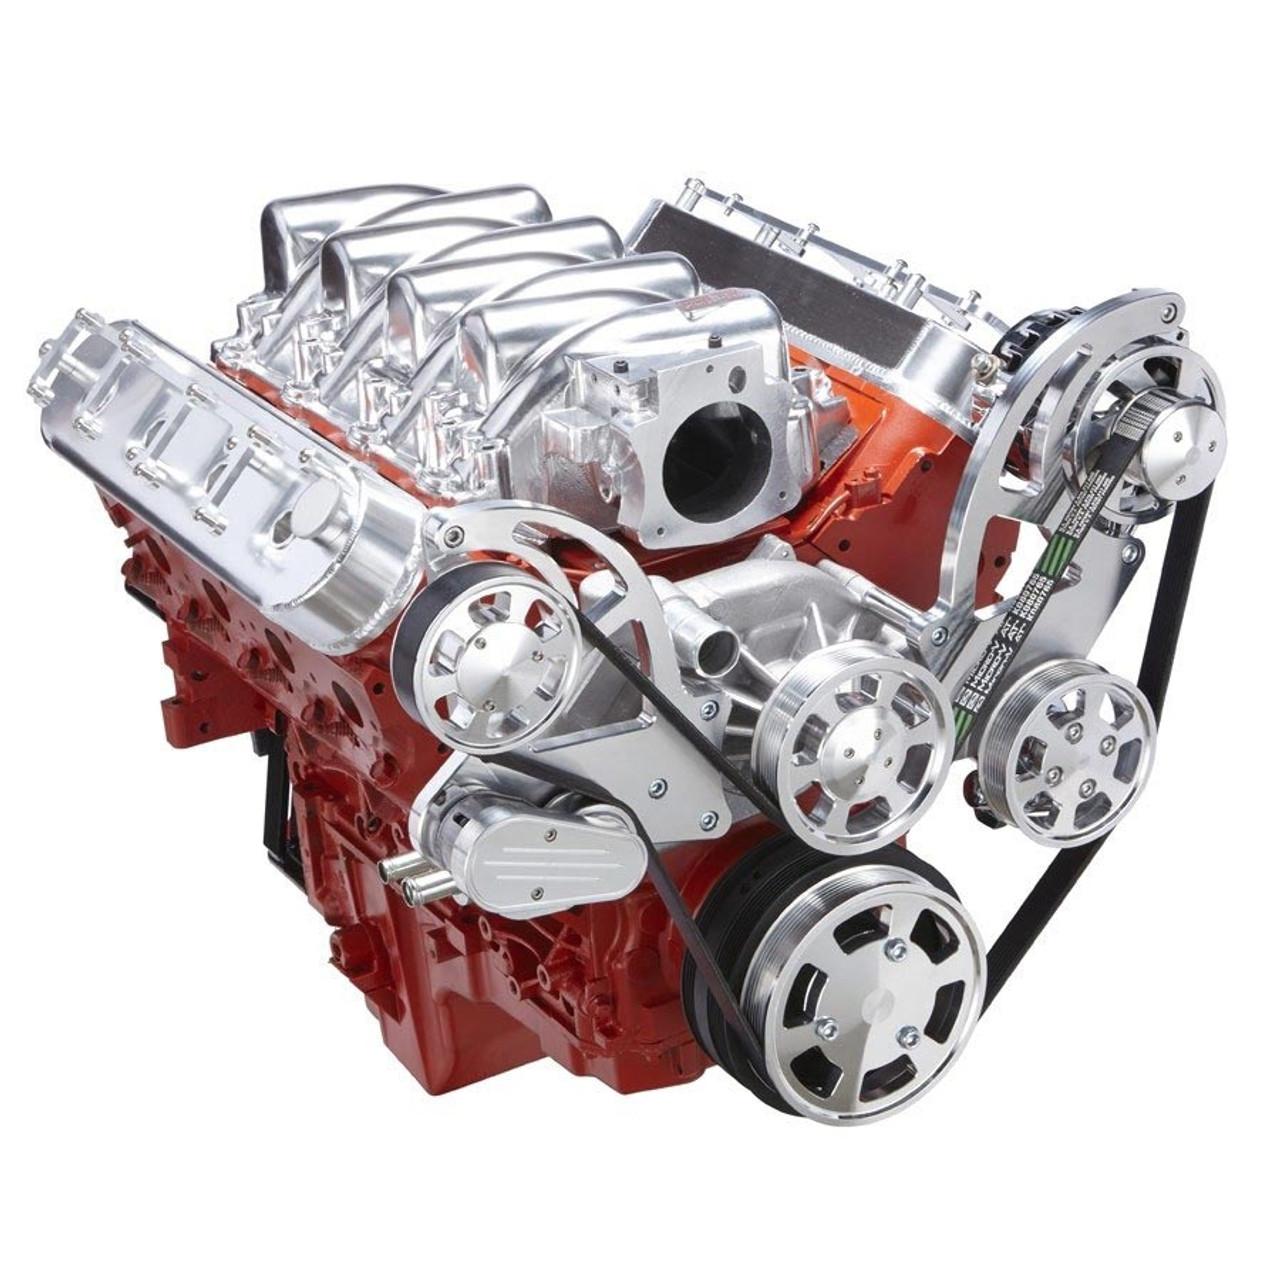 chevy ls serpentine kit power steering alternator [ 900 x 900 Pixel ]